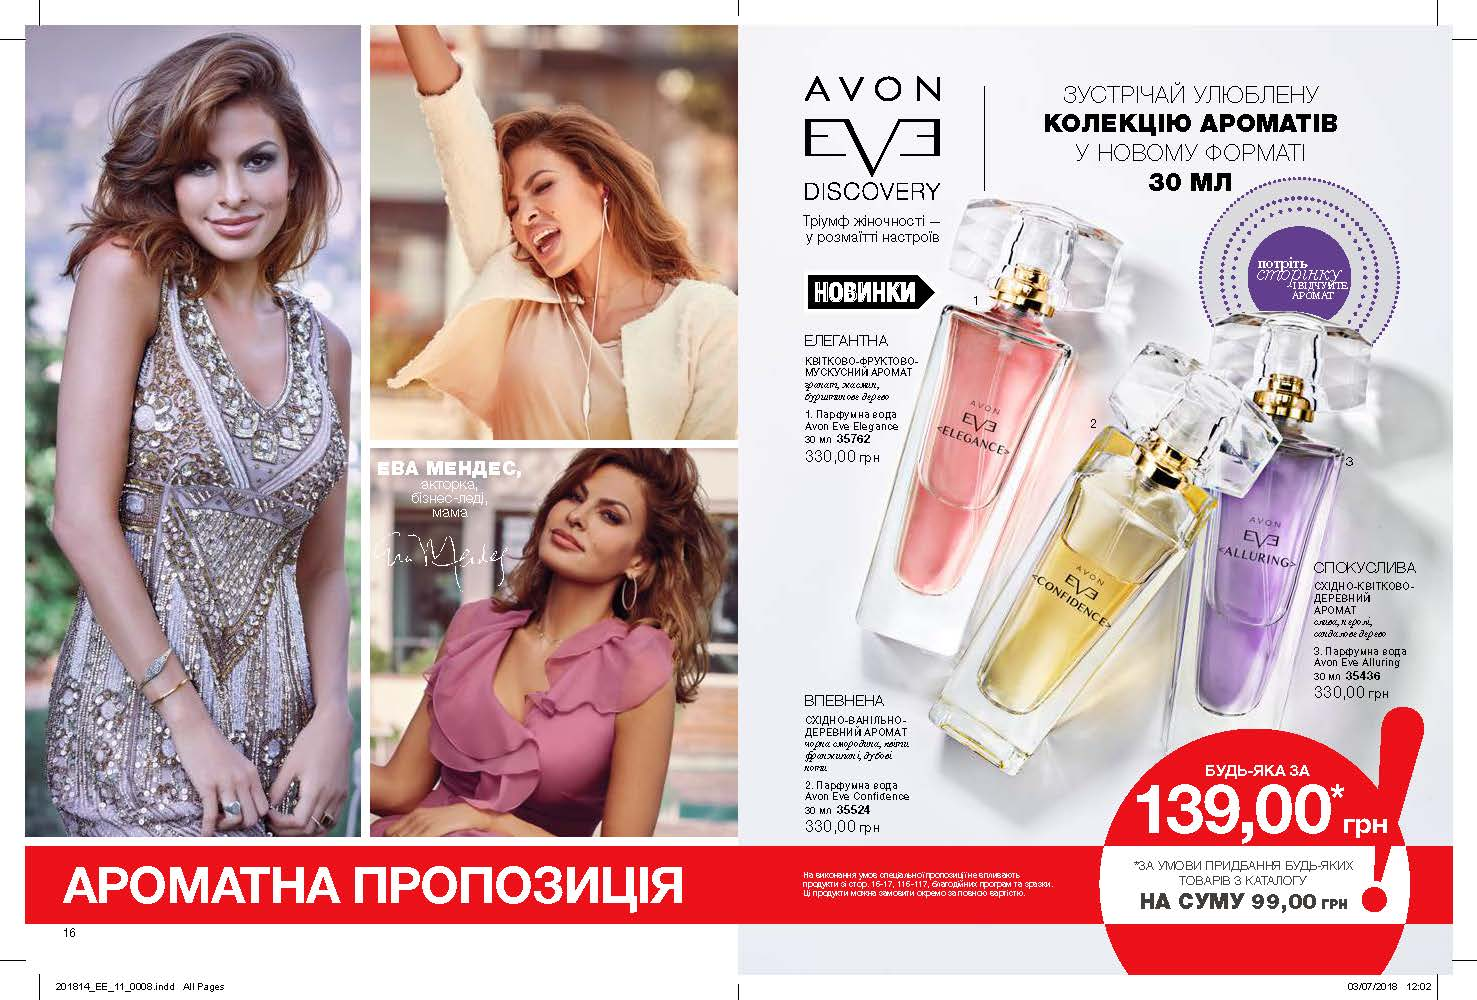 Сайт эйвон украина каталог avon заказать каталог